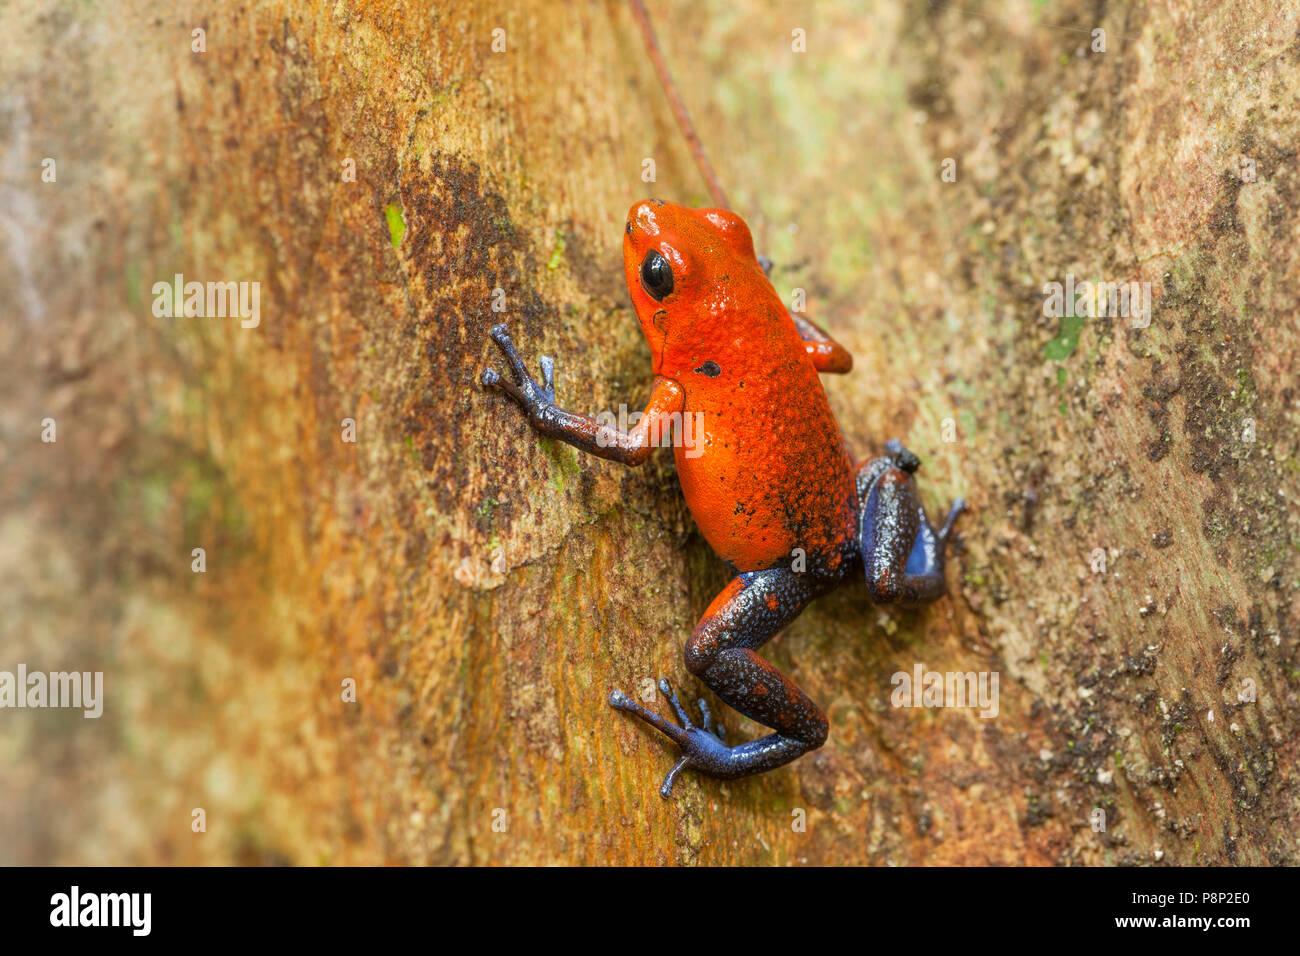 Strawberry Poison-dart Frog (Oophaga pumilio) climbing on a tree - Stock Image